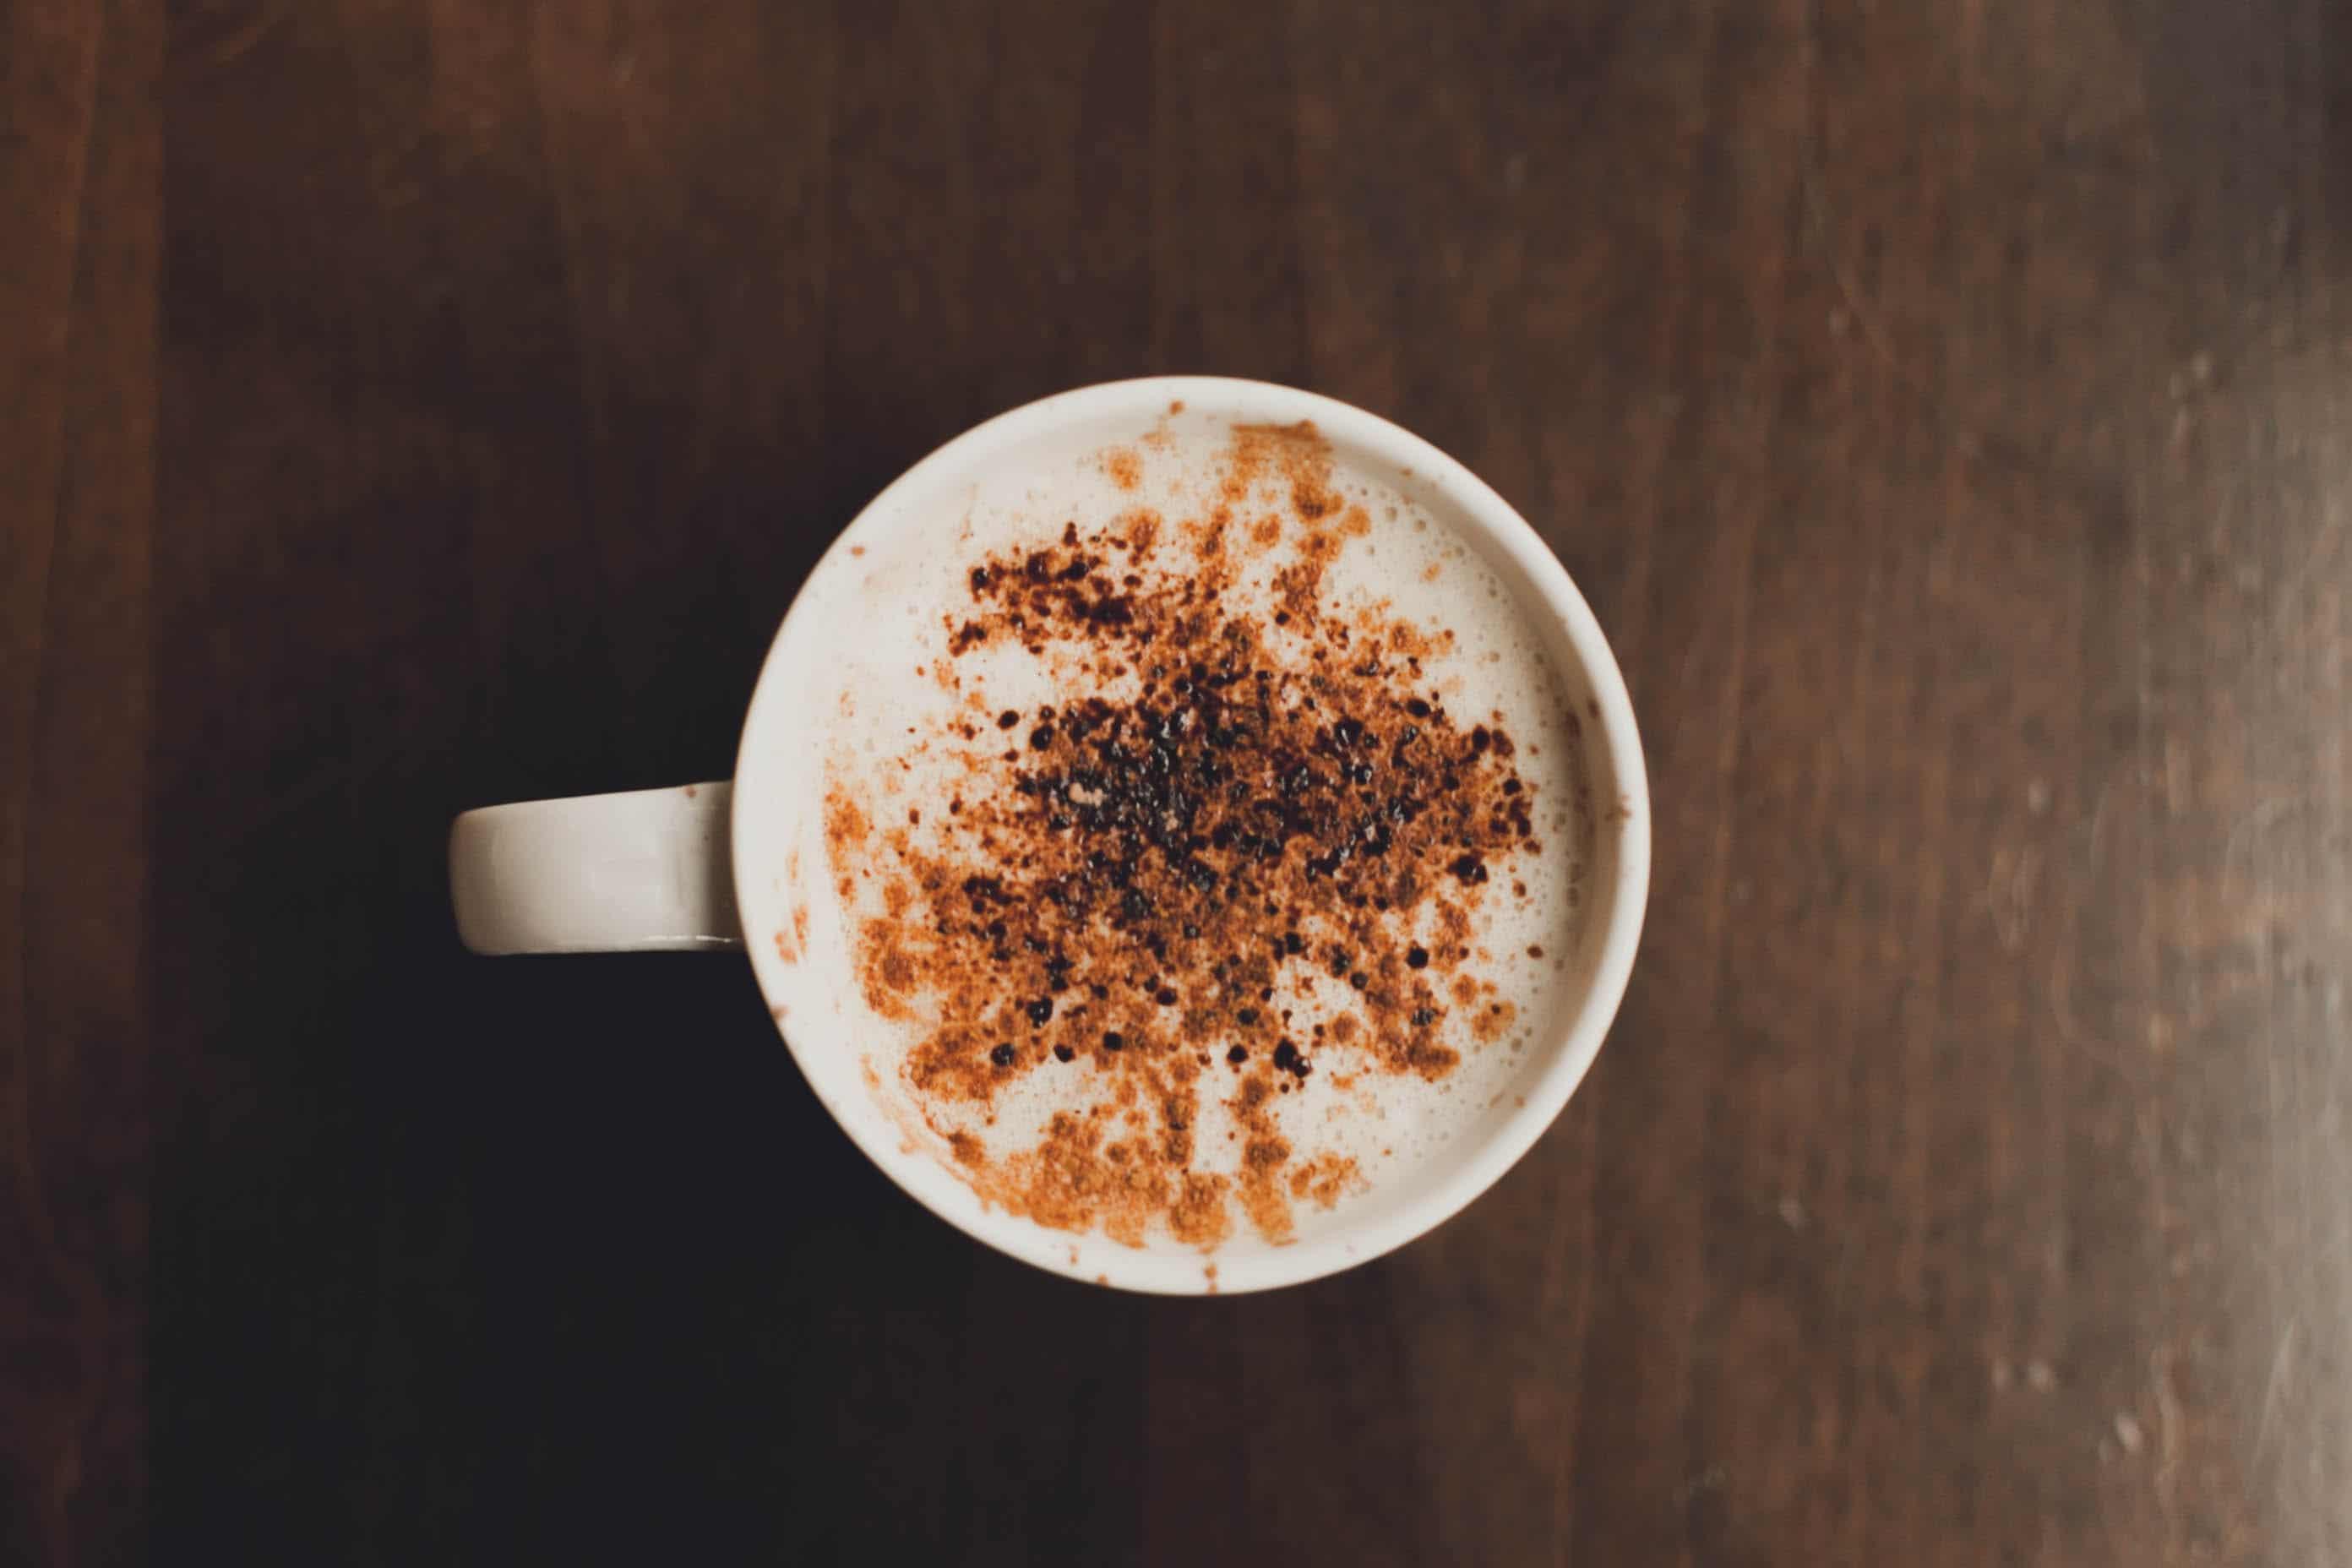 Cinnamon Pumpkin Spiced Latte ( For People Who Don't Like Pumpkin Spiced Lattes )